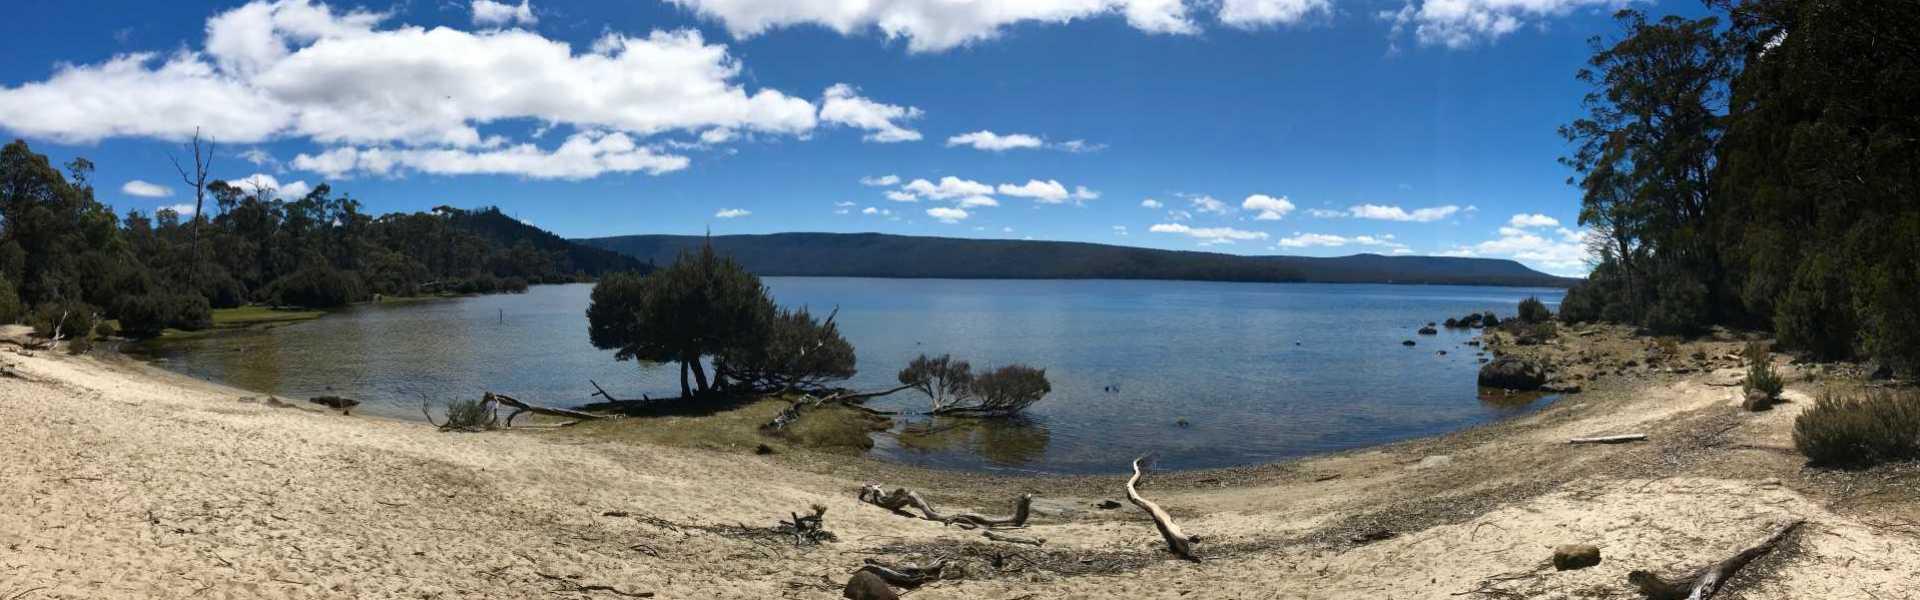 Lake St. Claire, Tasmania